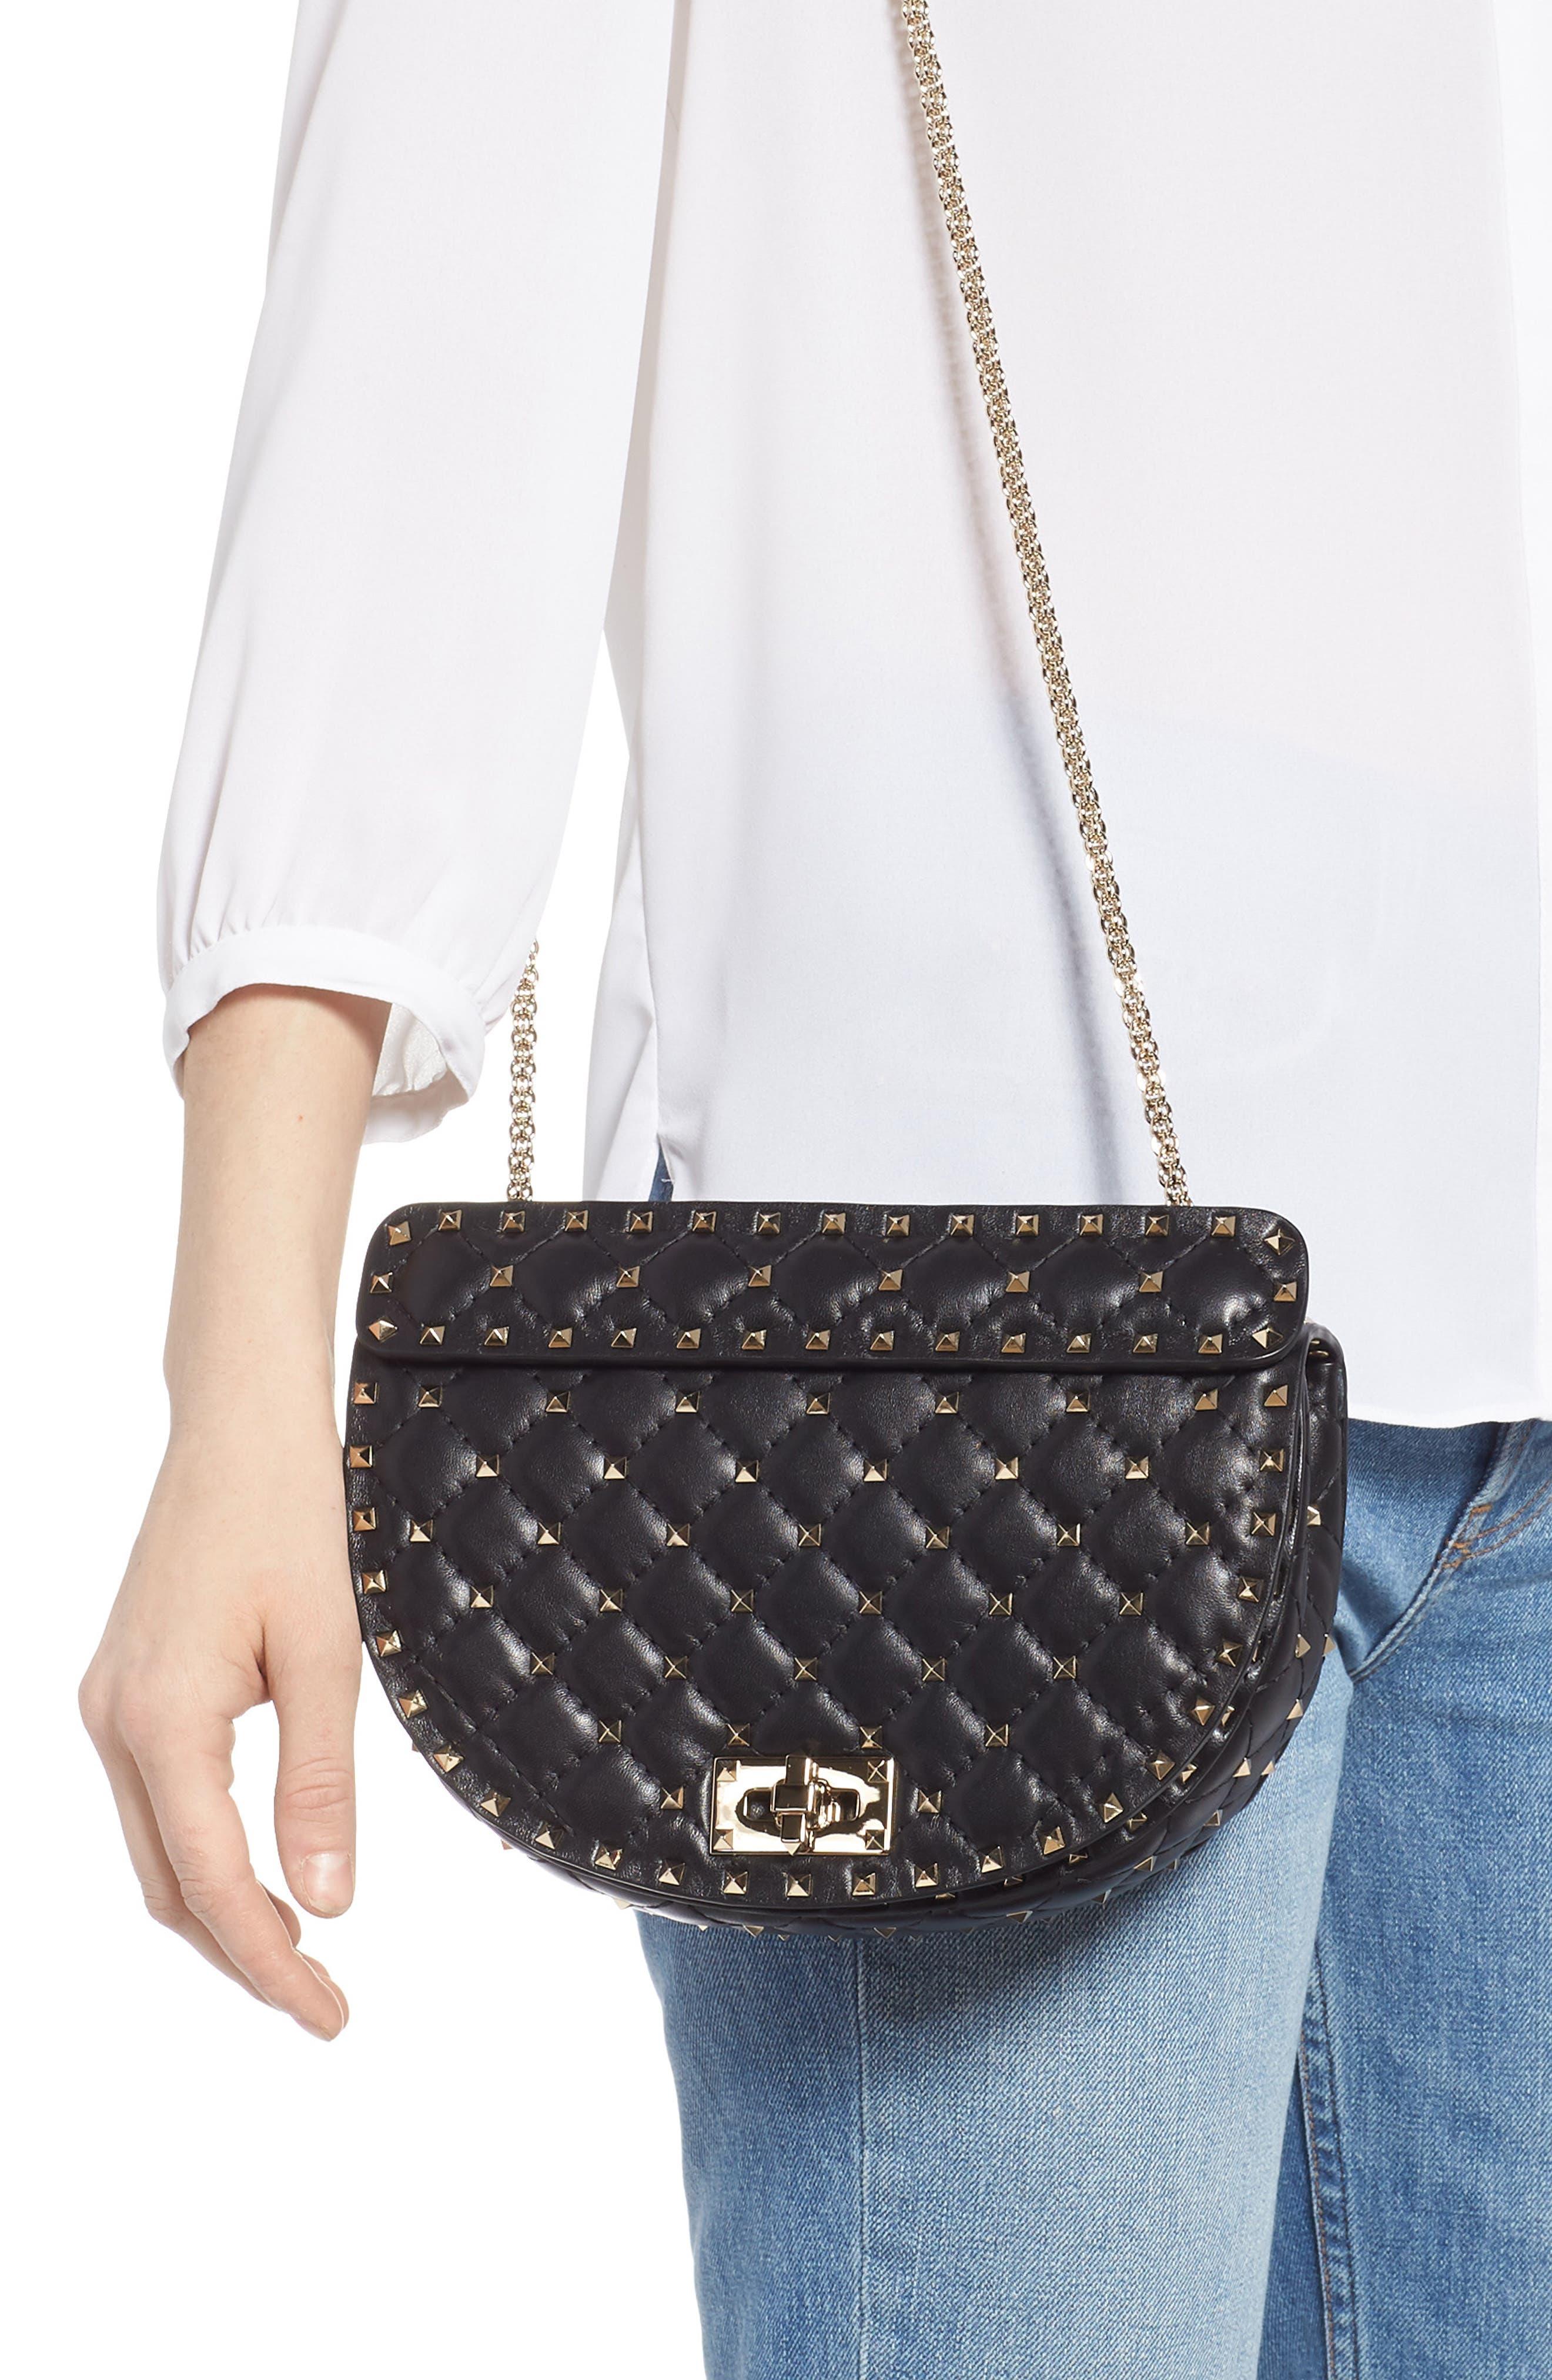 Rockstud Spike Leather Saddle Bag,                             Alternate thumbnail 2, color,                             NERO